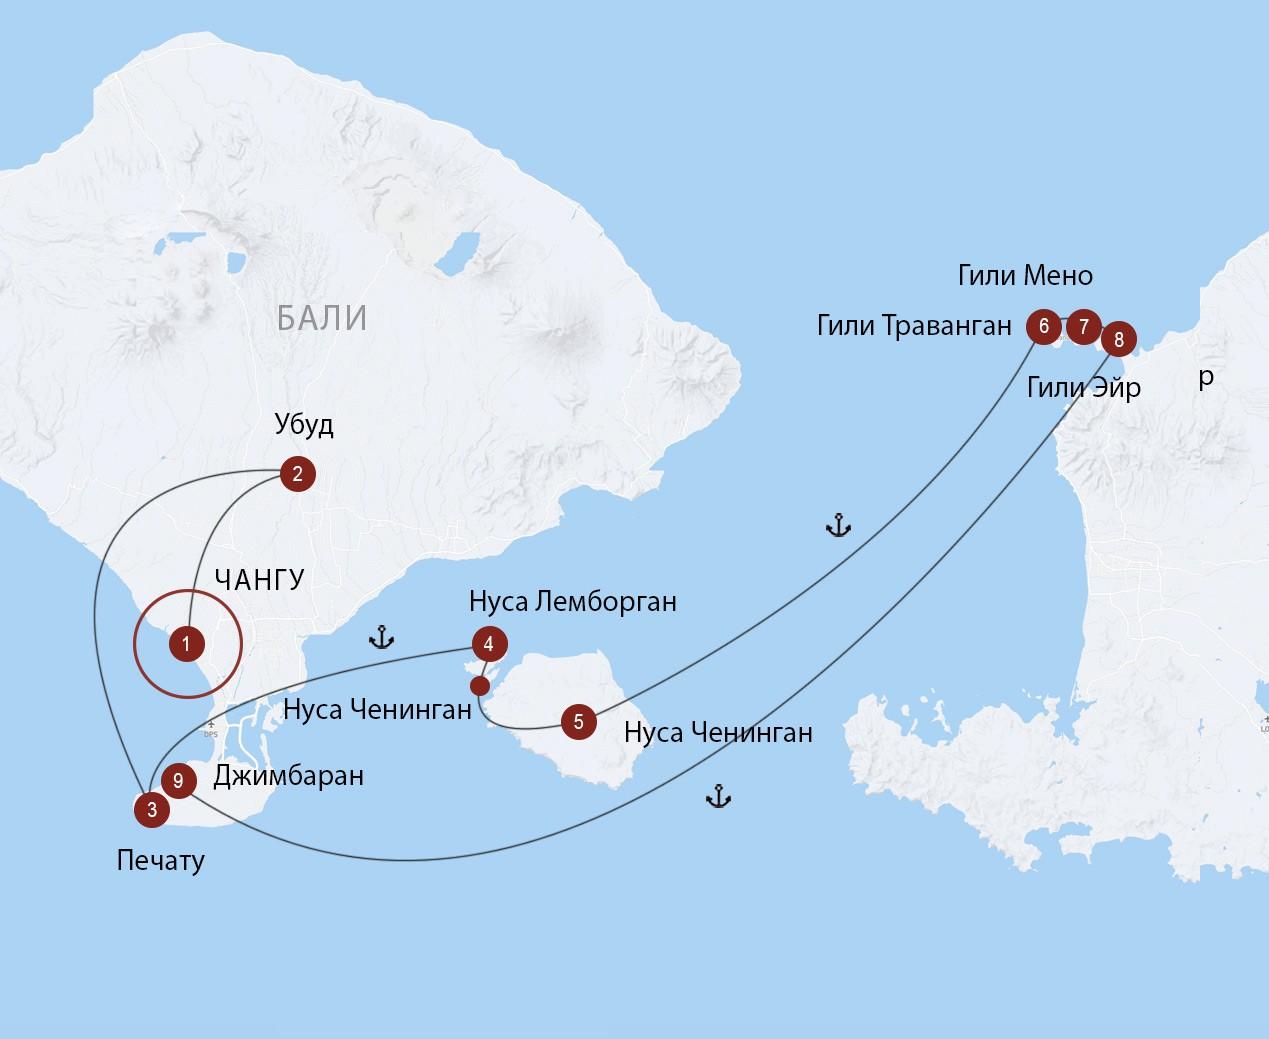 С острова на остров: Бали, острова Нуса и Гили (большой маршрут)